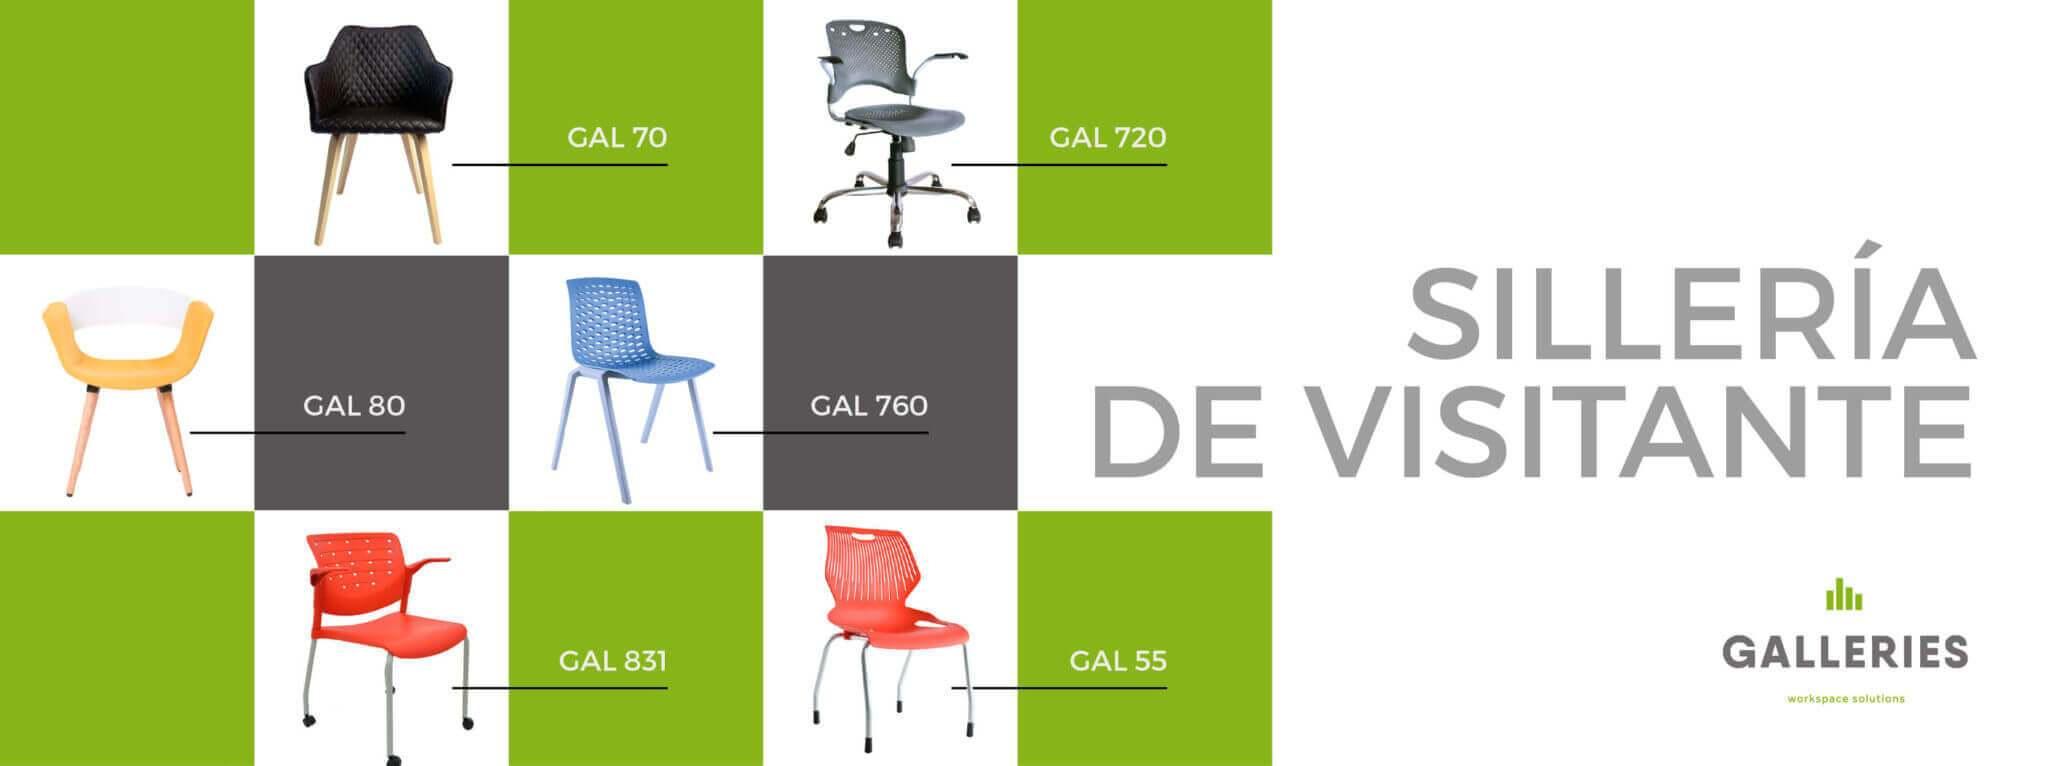 sillas-para-visitas-de-oficina